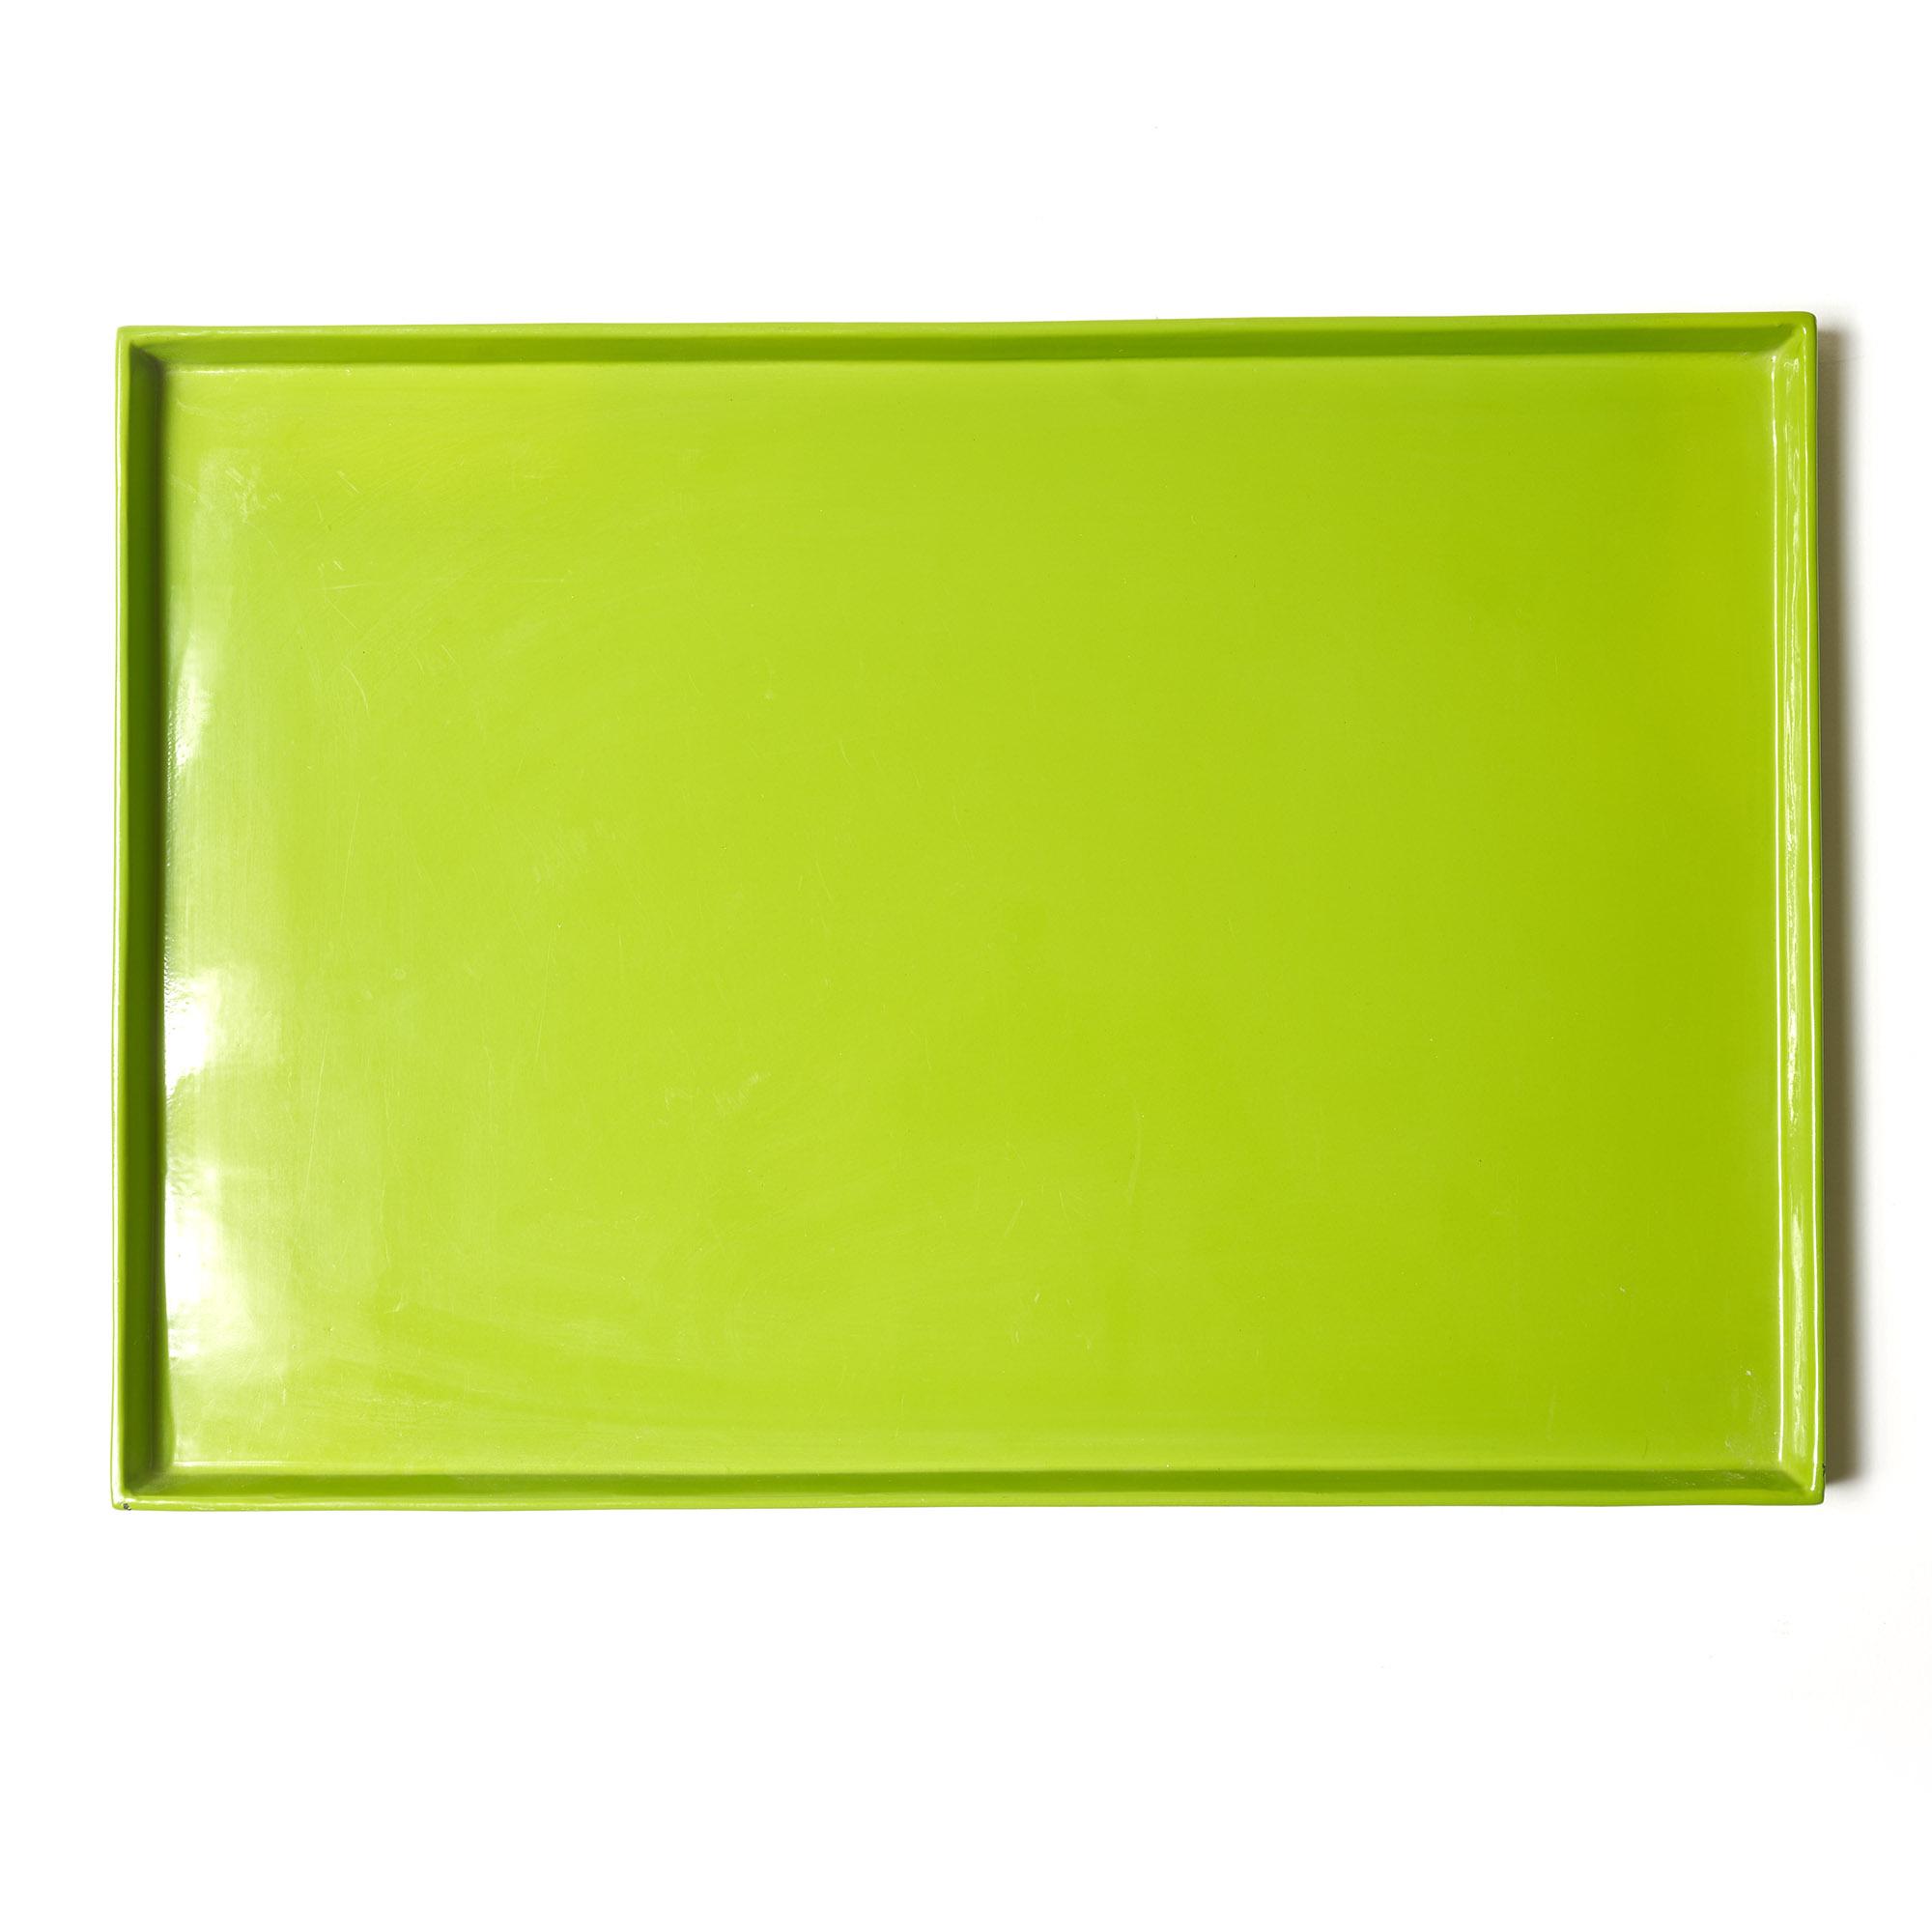 Bandeja laca verde 35 x 50 cm